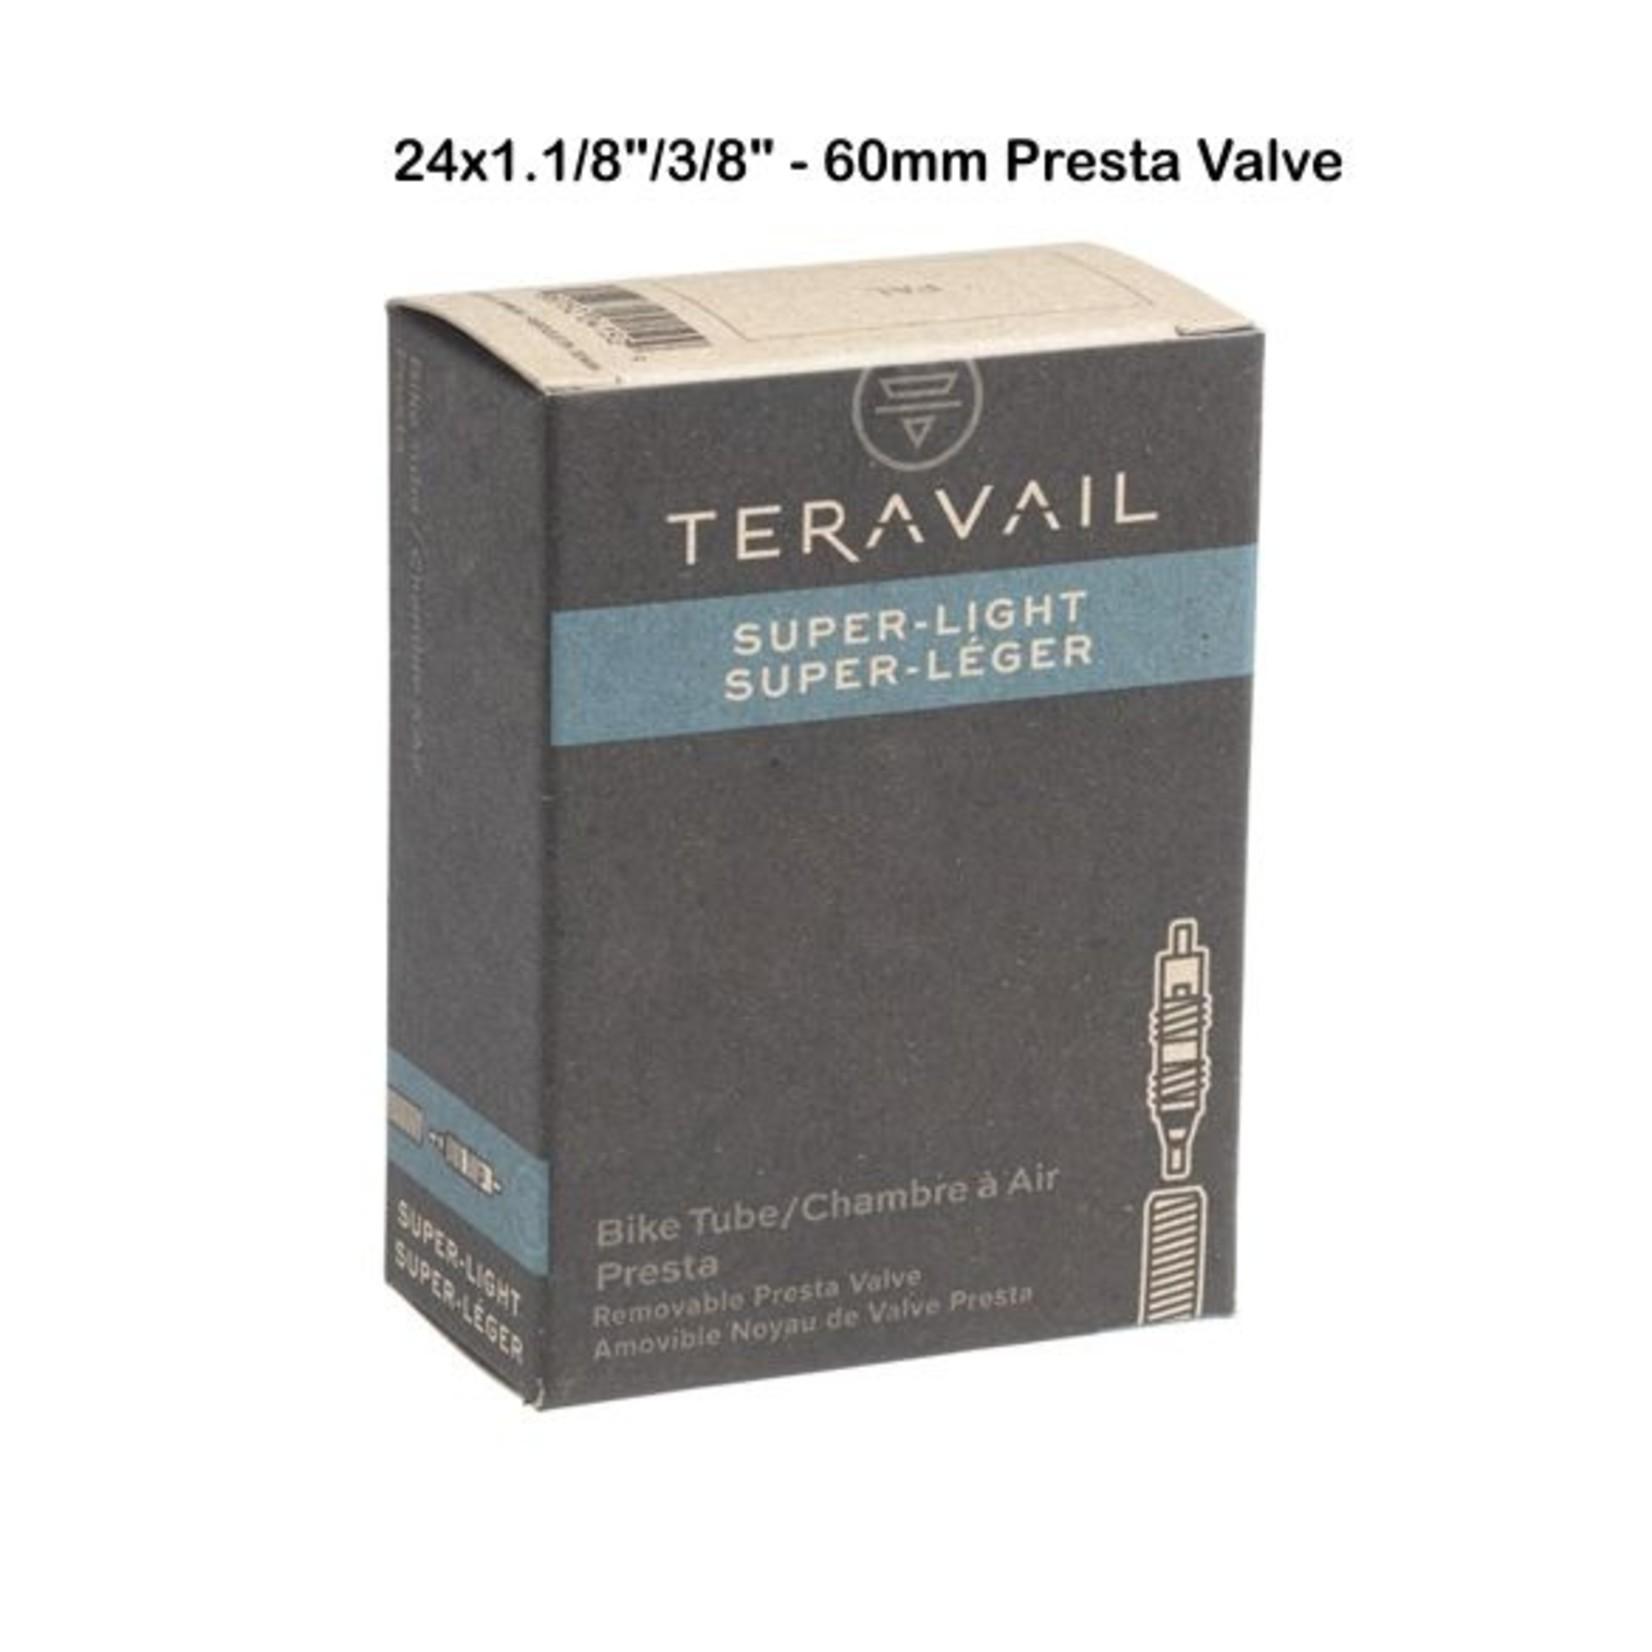 "Teravail Superlight 24x 1-1/8"" -1-3/8"" 60mm PV"